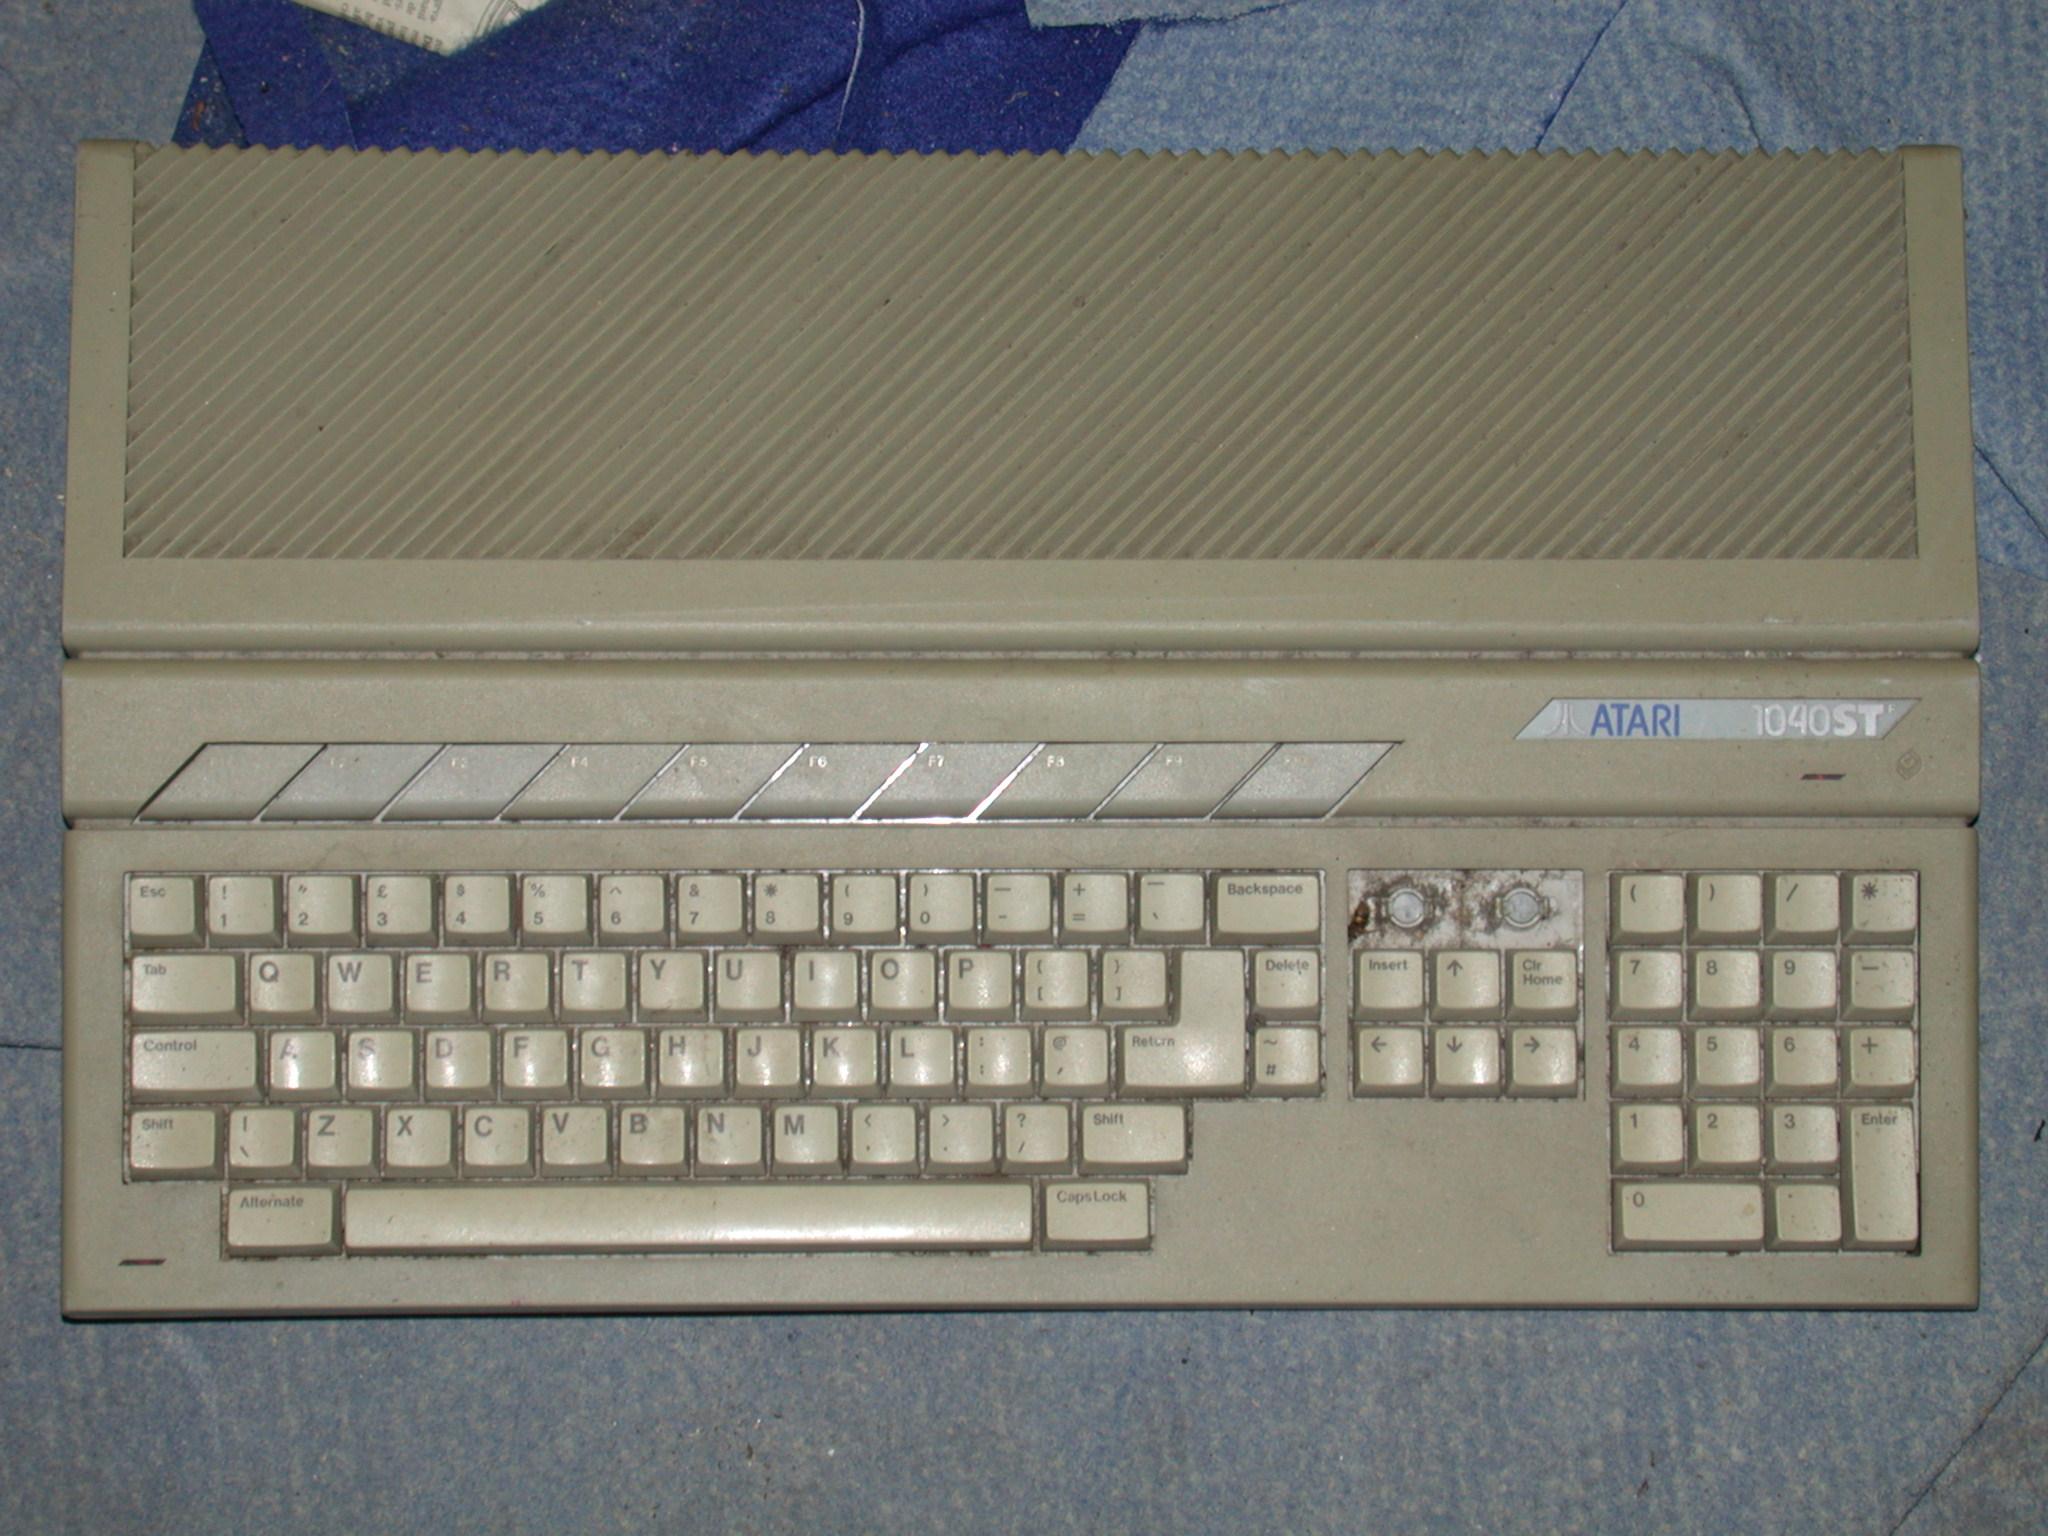 objects antique keyboard computer atari 1040st atari1040st beige plastic